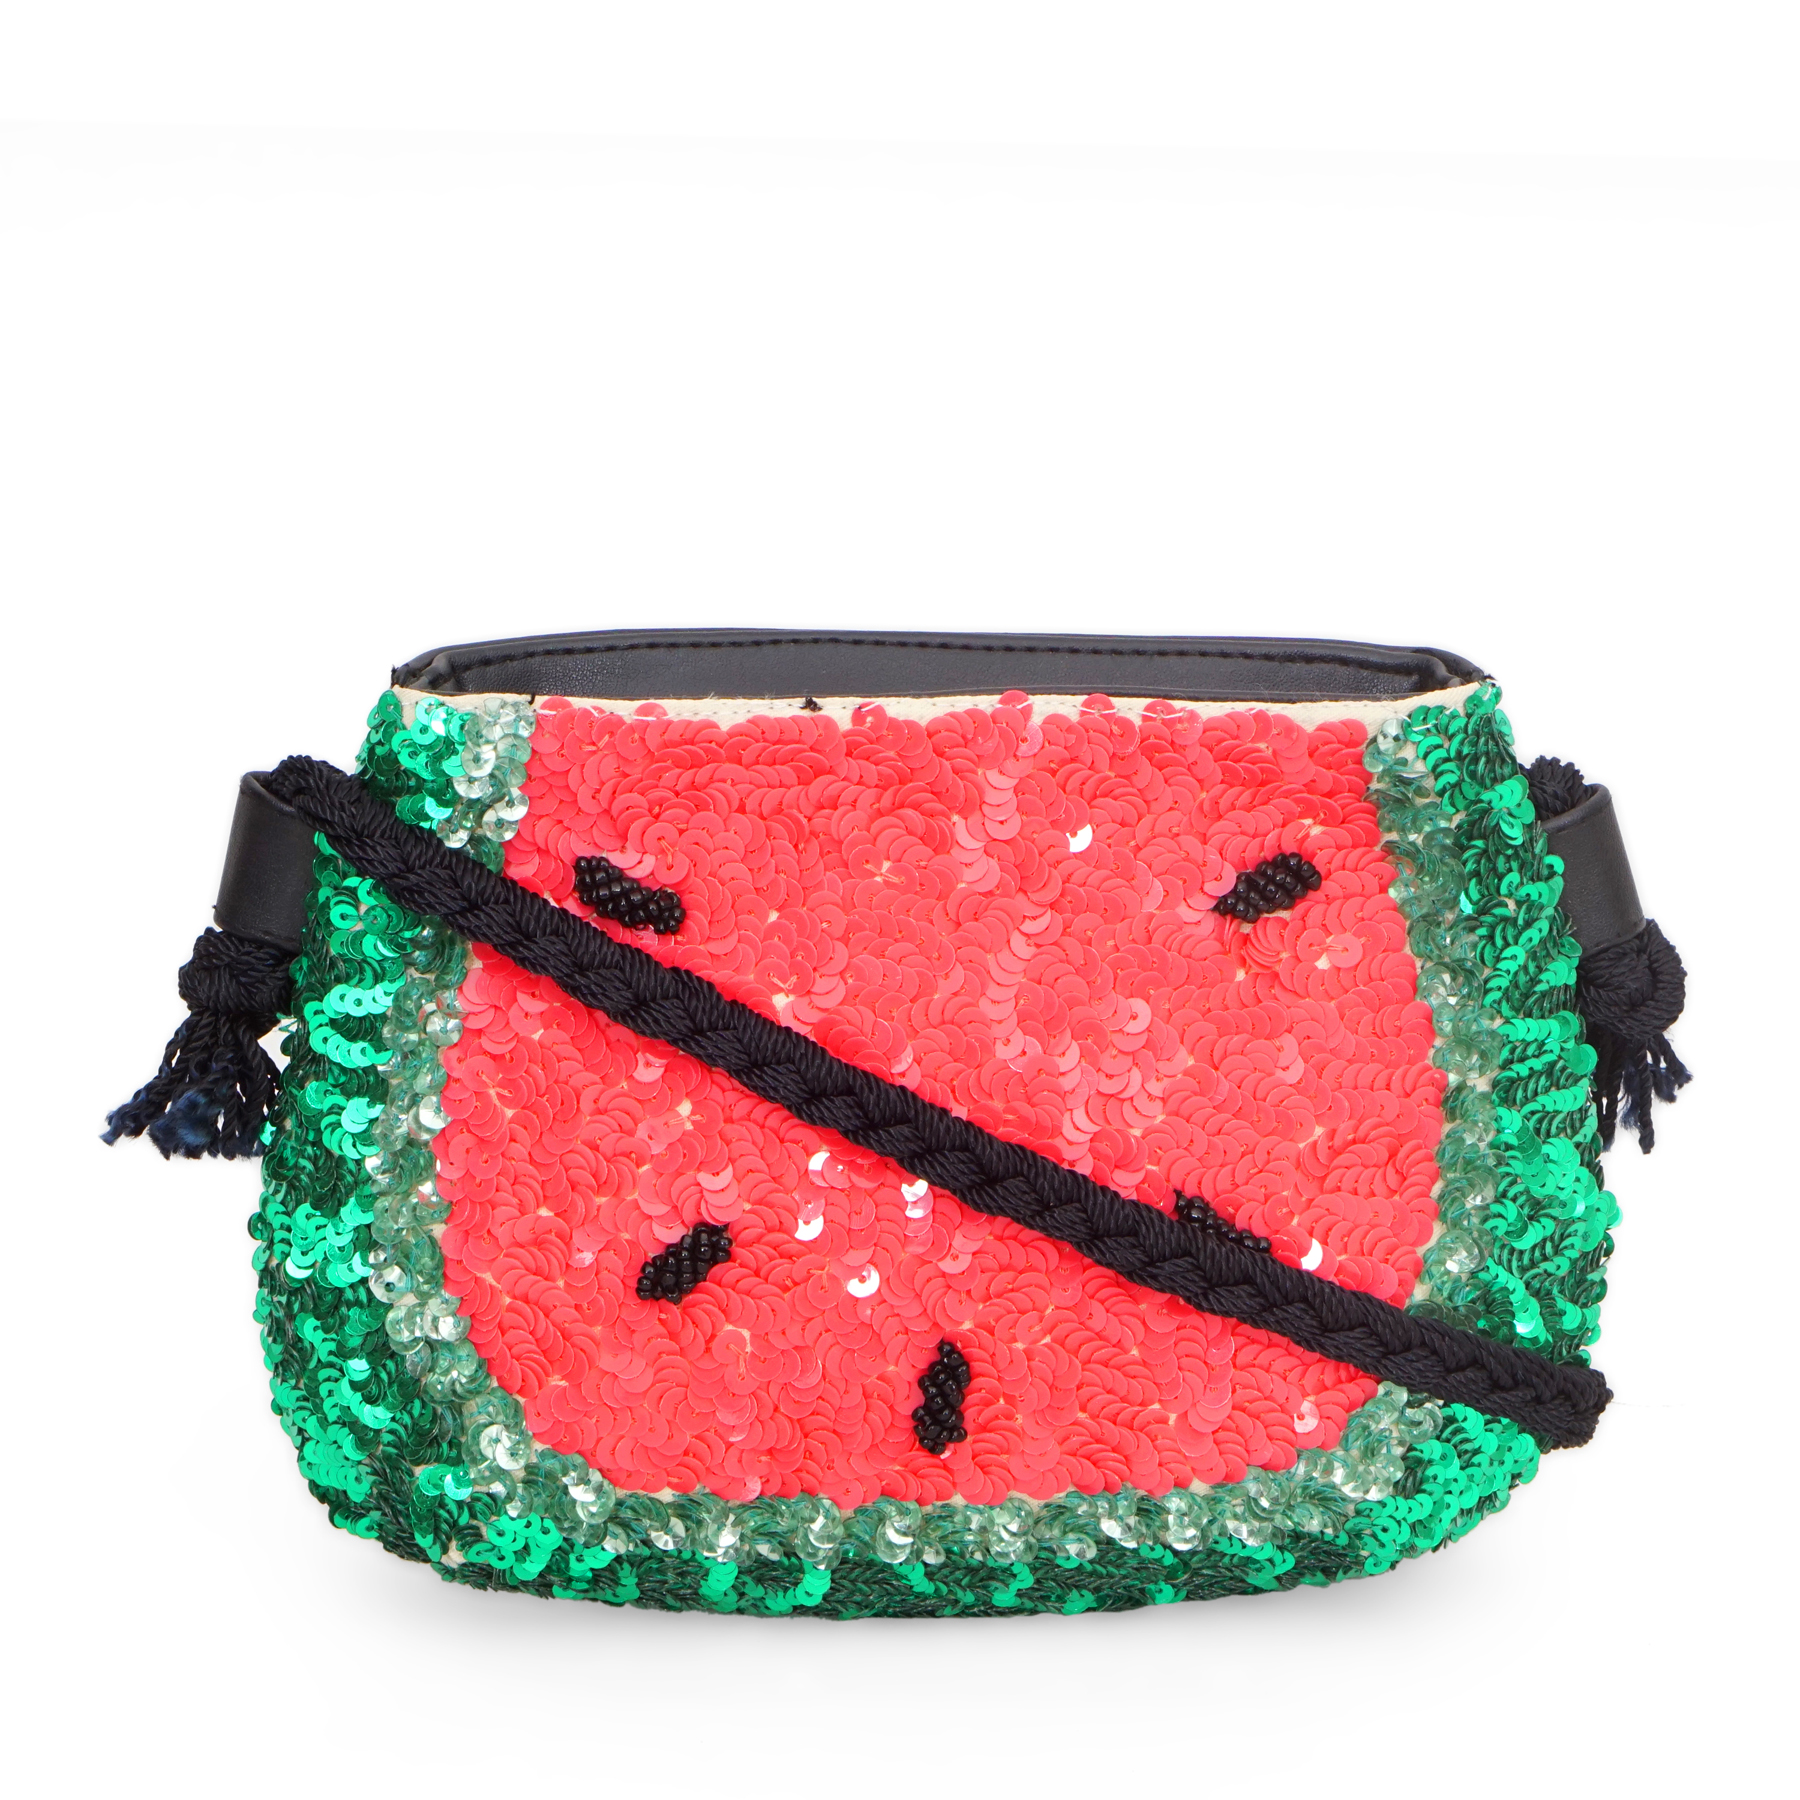 DIWAAH | Diwaah Multi Color Party Sling Bag